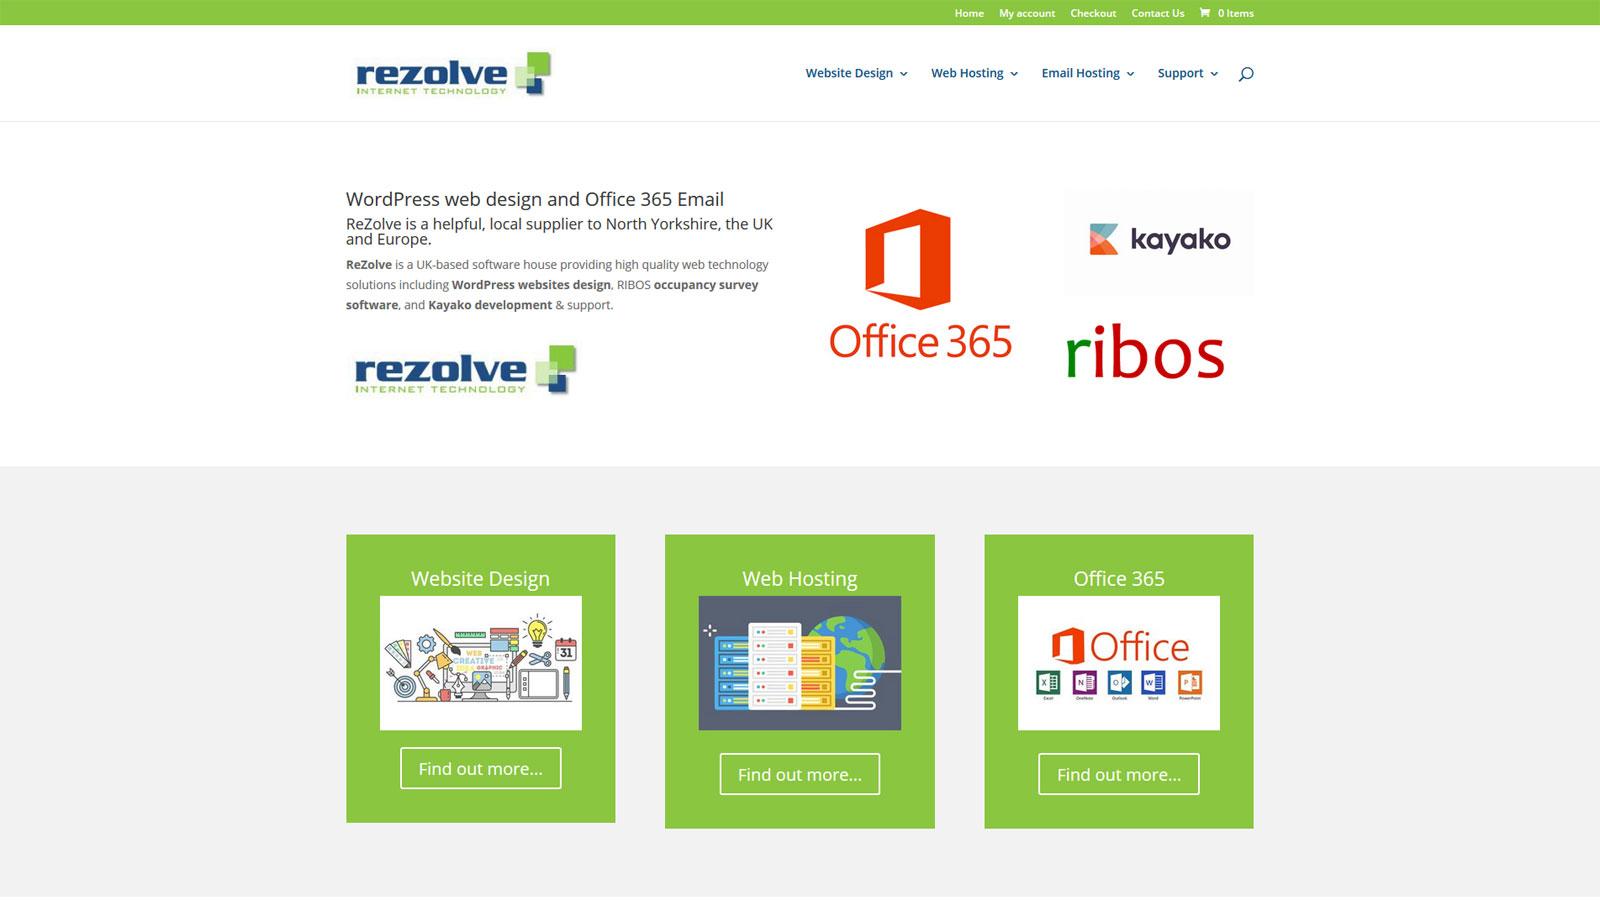 www.rezolve.co.uk